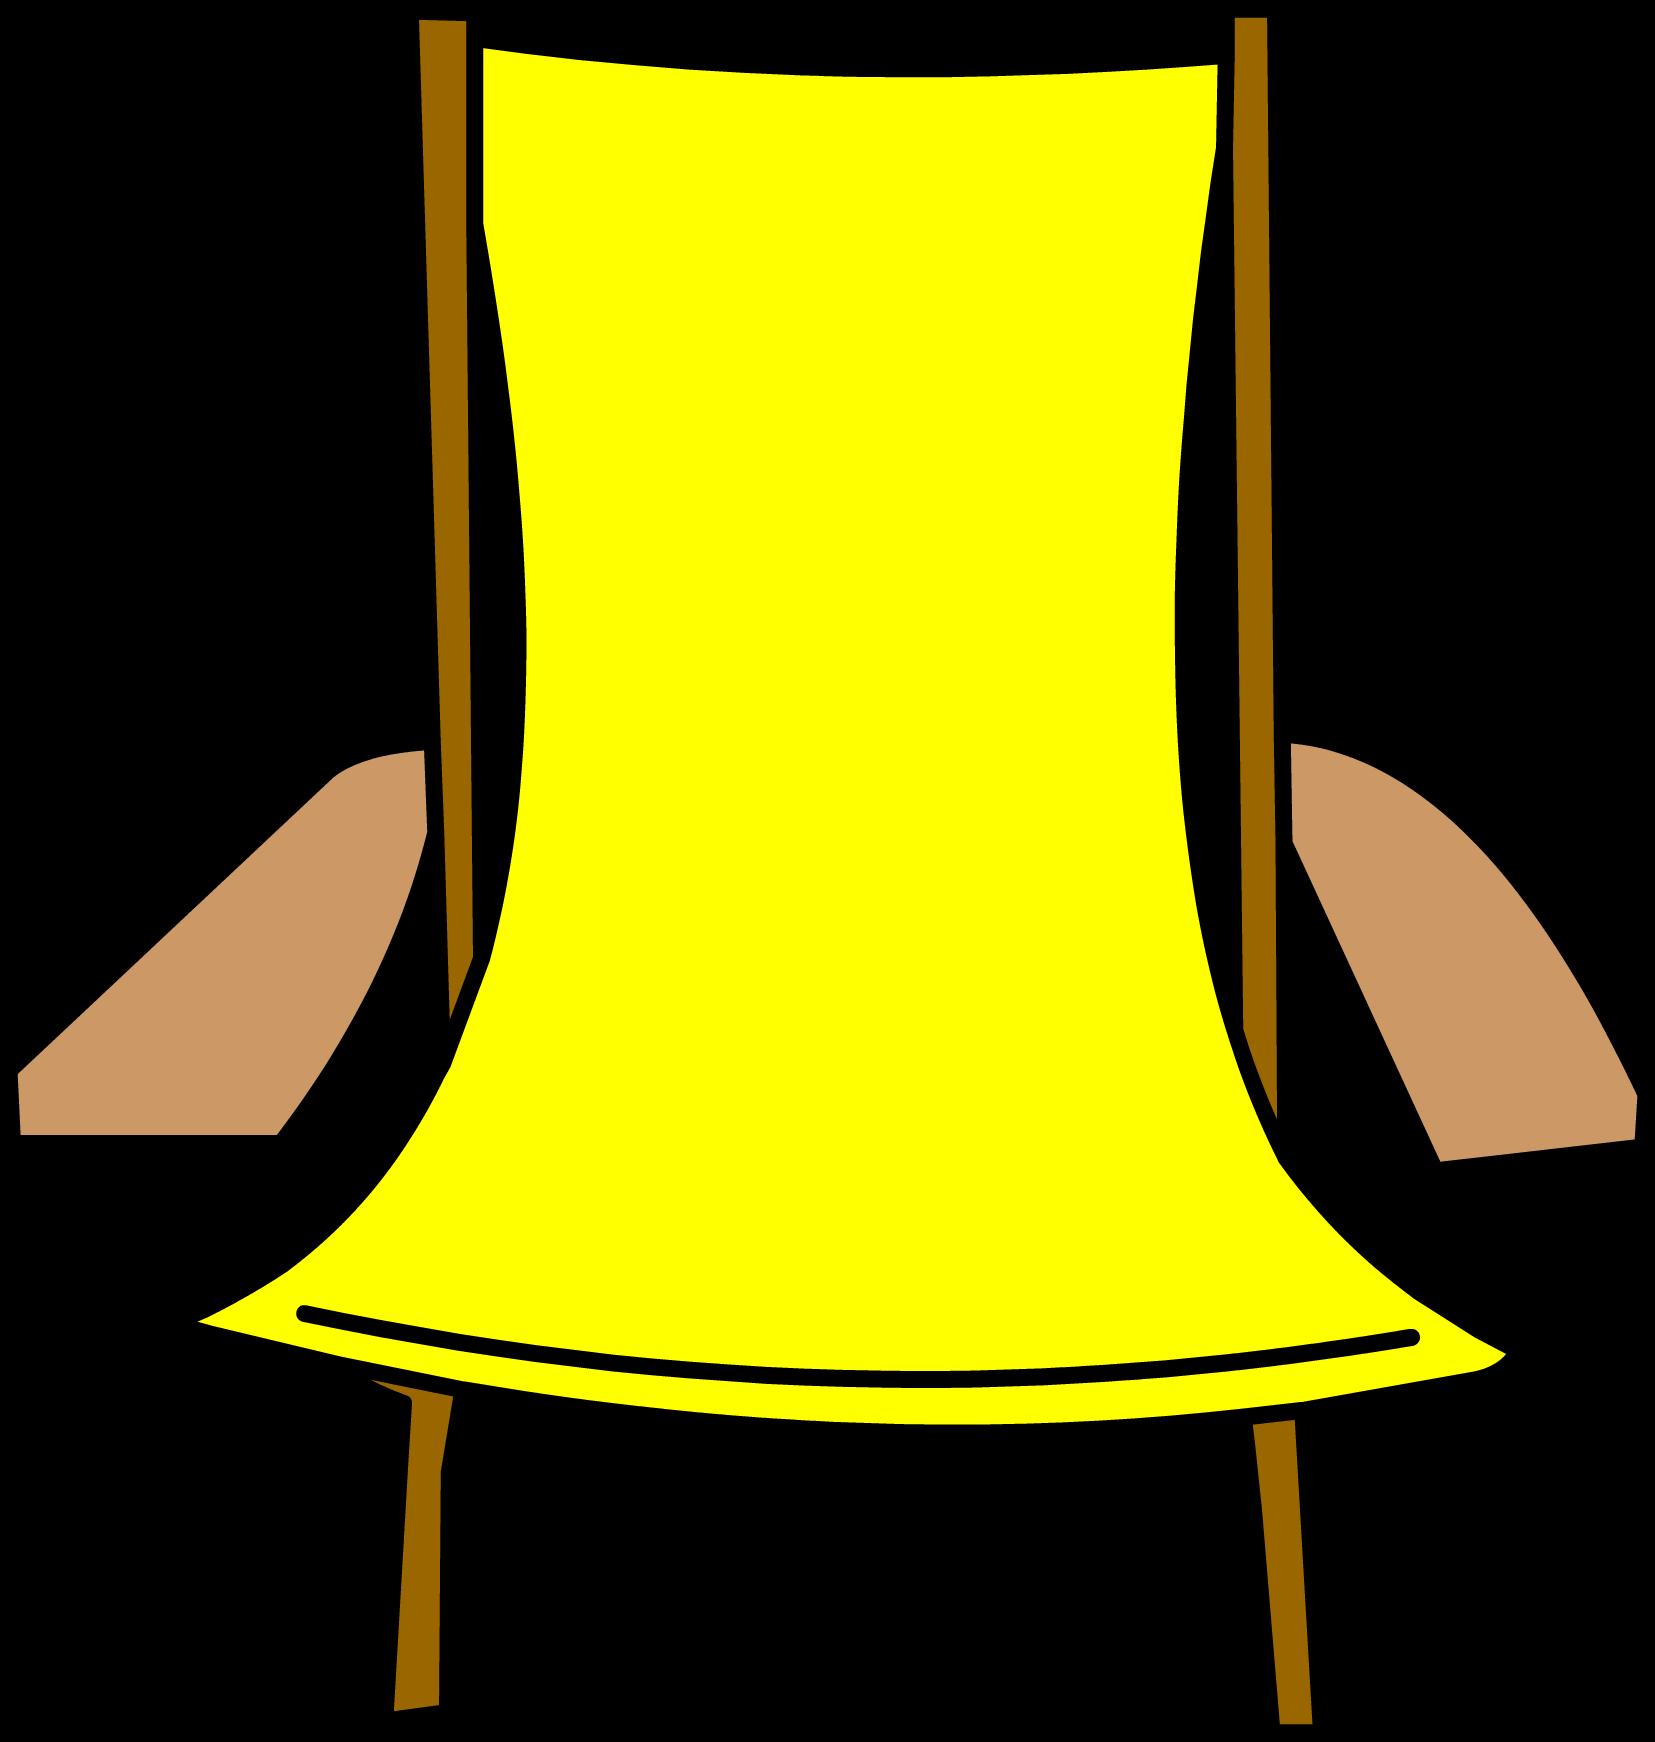 Folding Chair Club Penguin Wiki